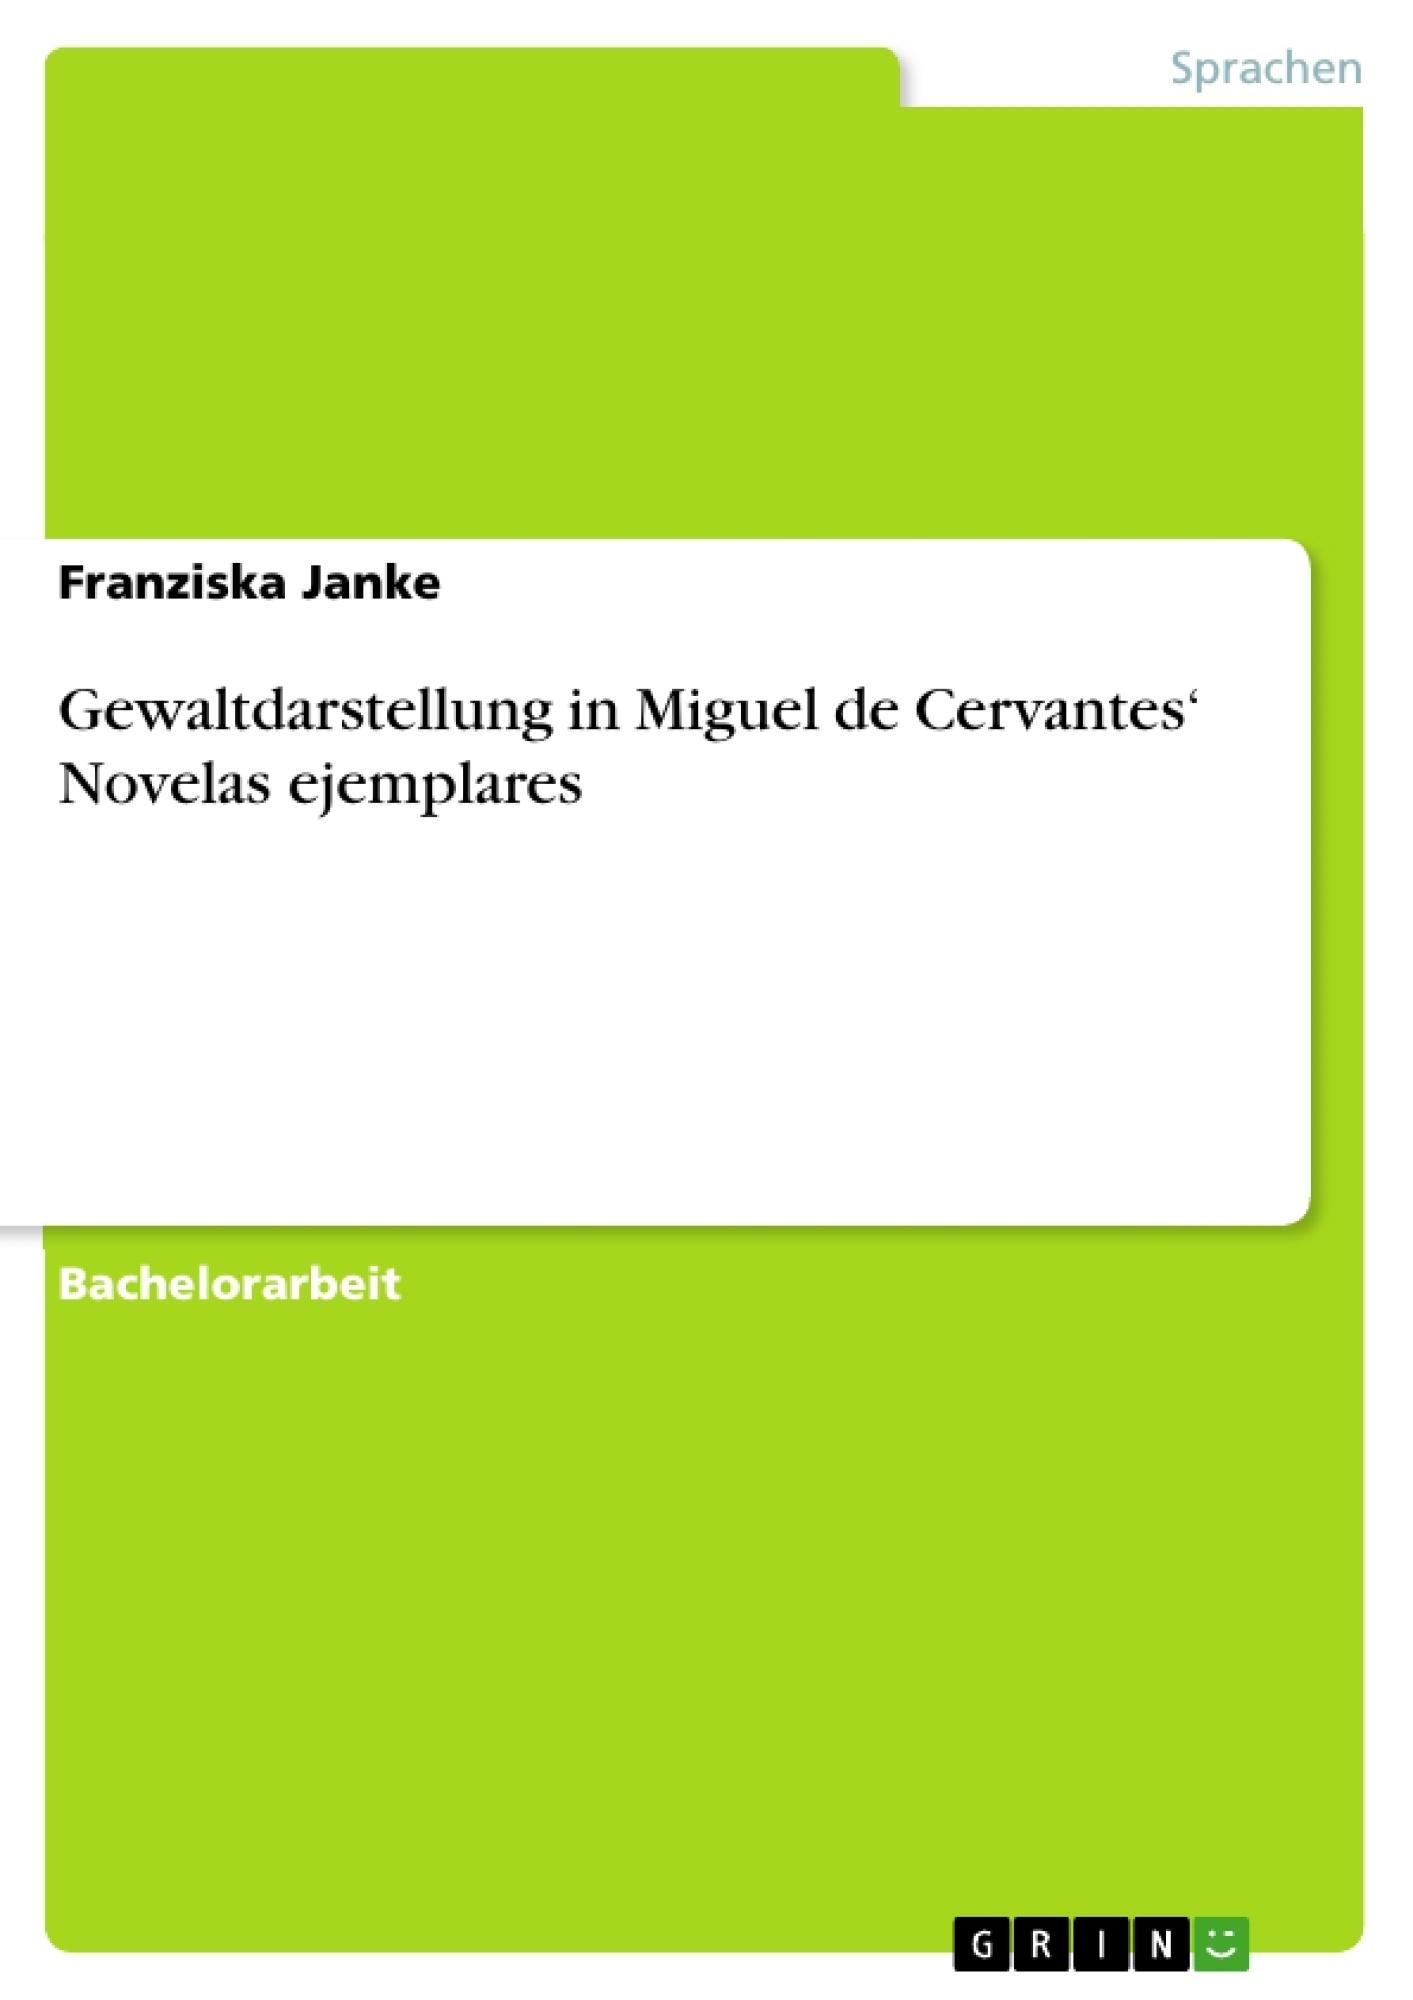 Titel: Gewaltdarstellung in Miguel de Cervantes' Novelas ejemplares